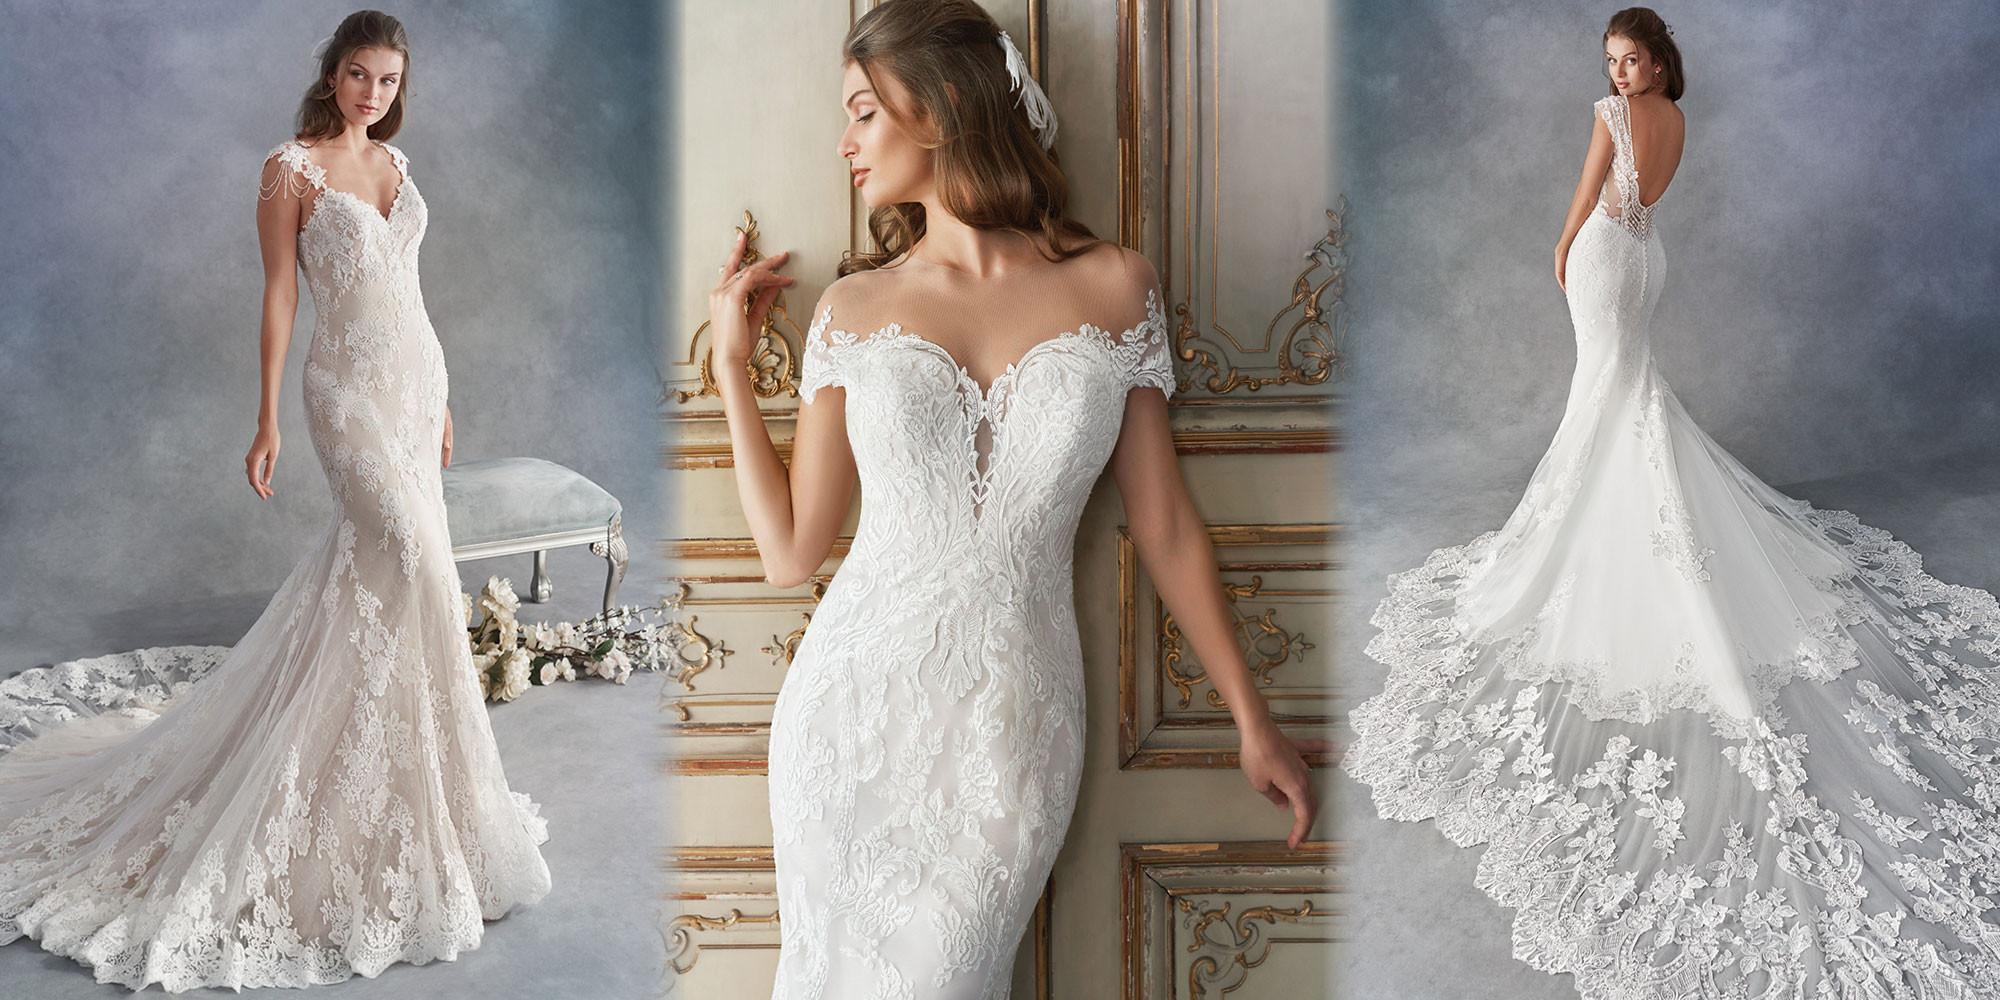 c3d05381a3c8d Kenneth Winston | Designer Wedding Dresses | Designed in California